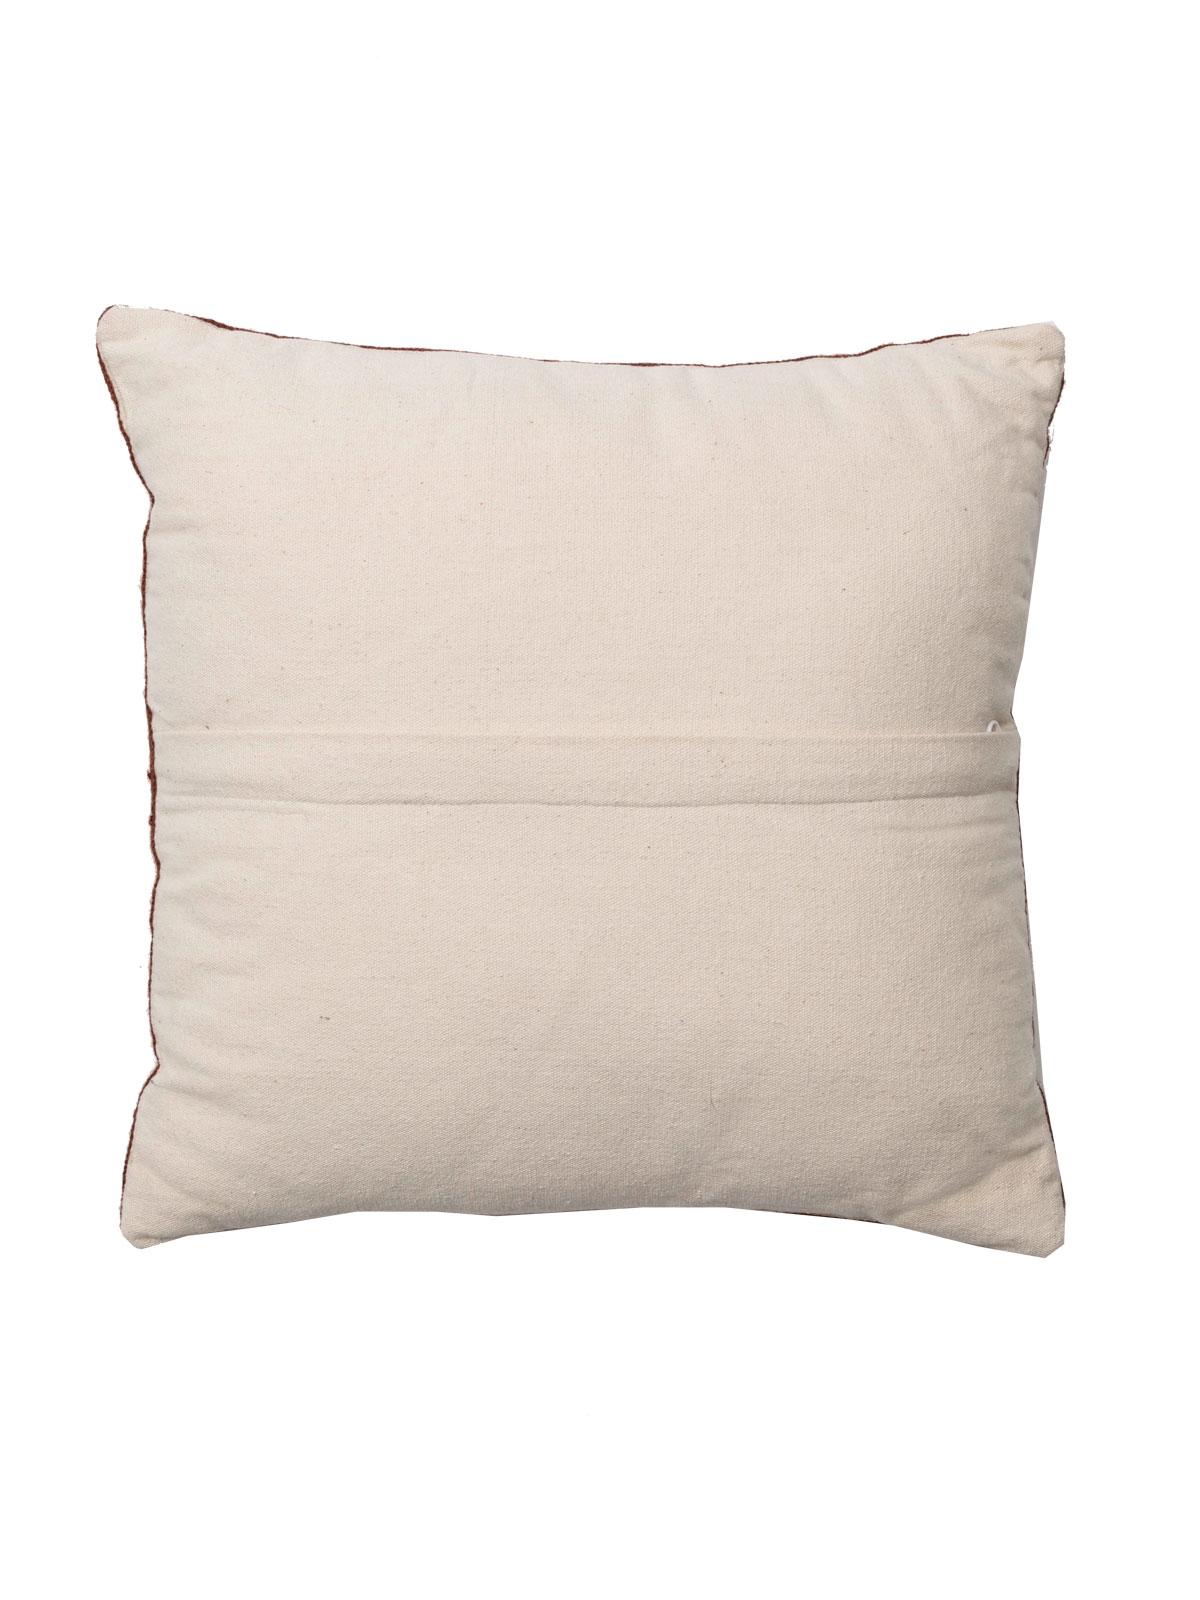 Sun Follower Crewel Cushion Attic Sale Your Home Attic